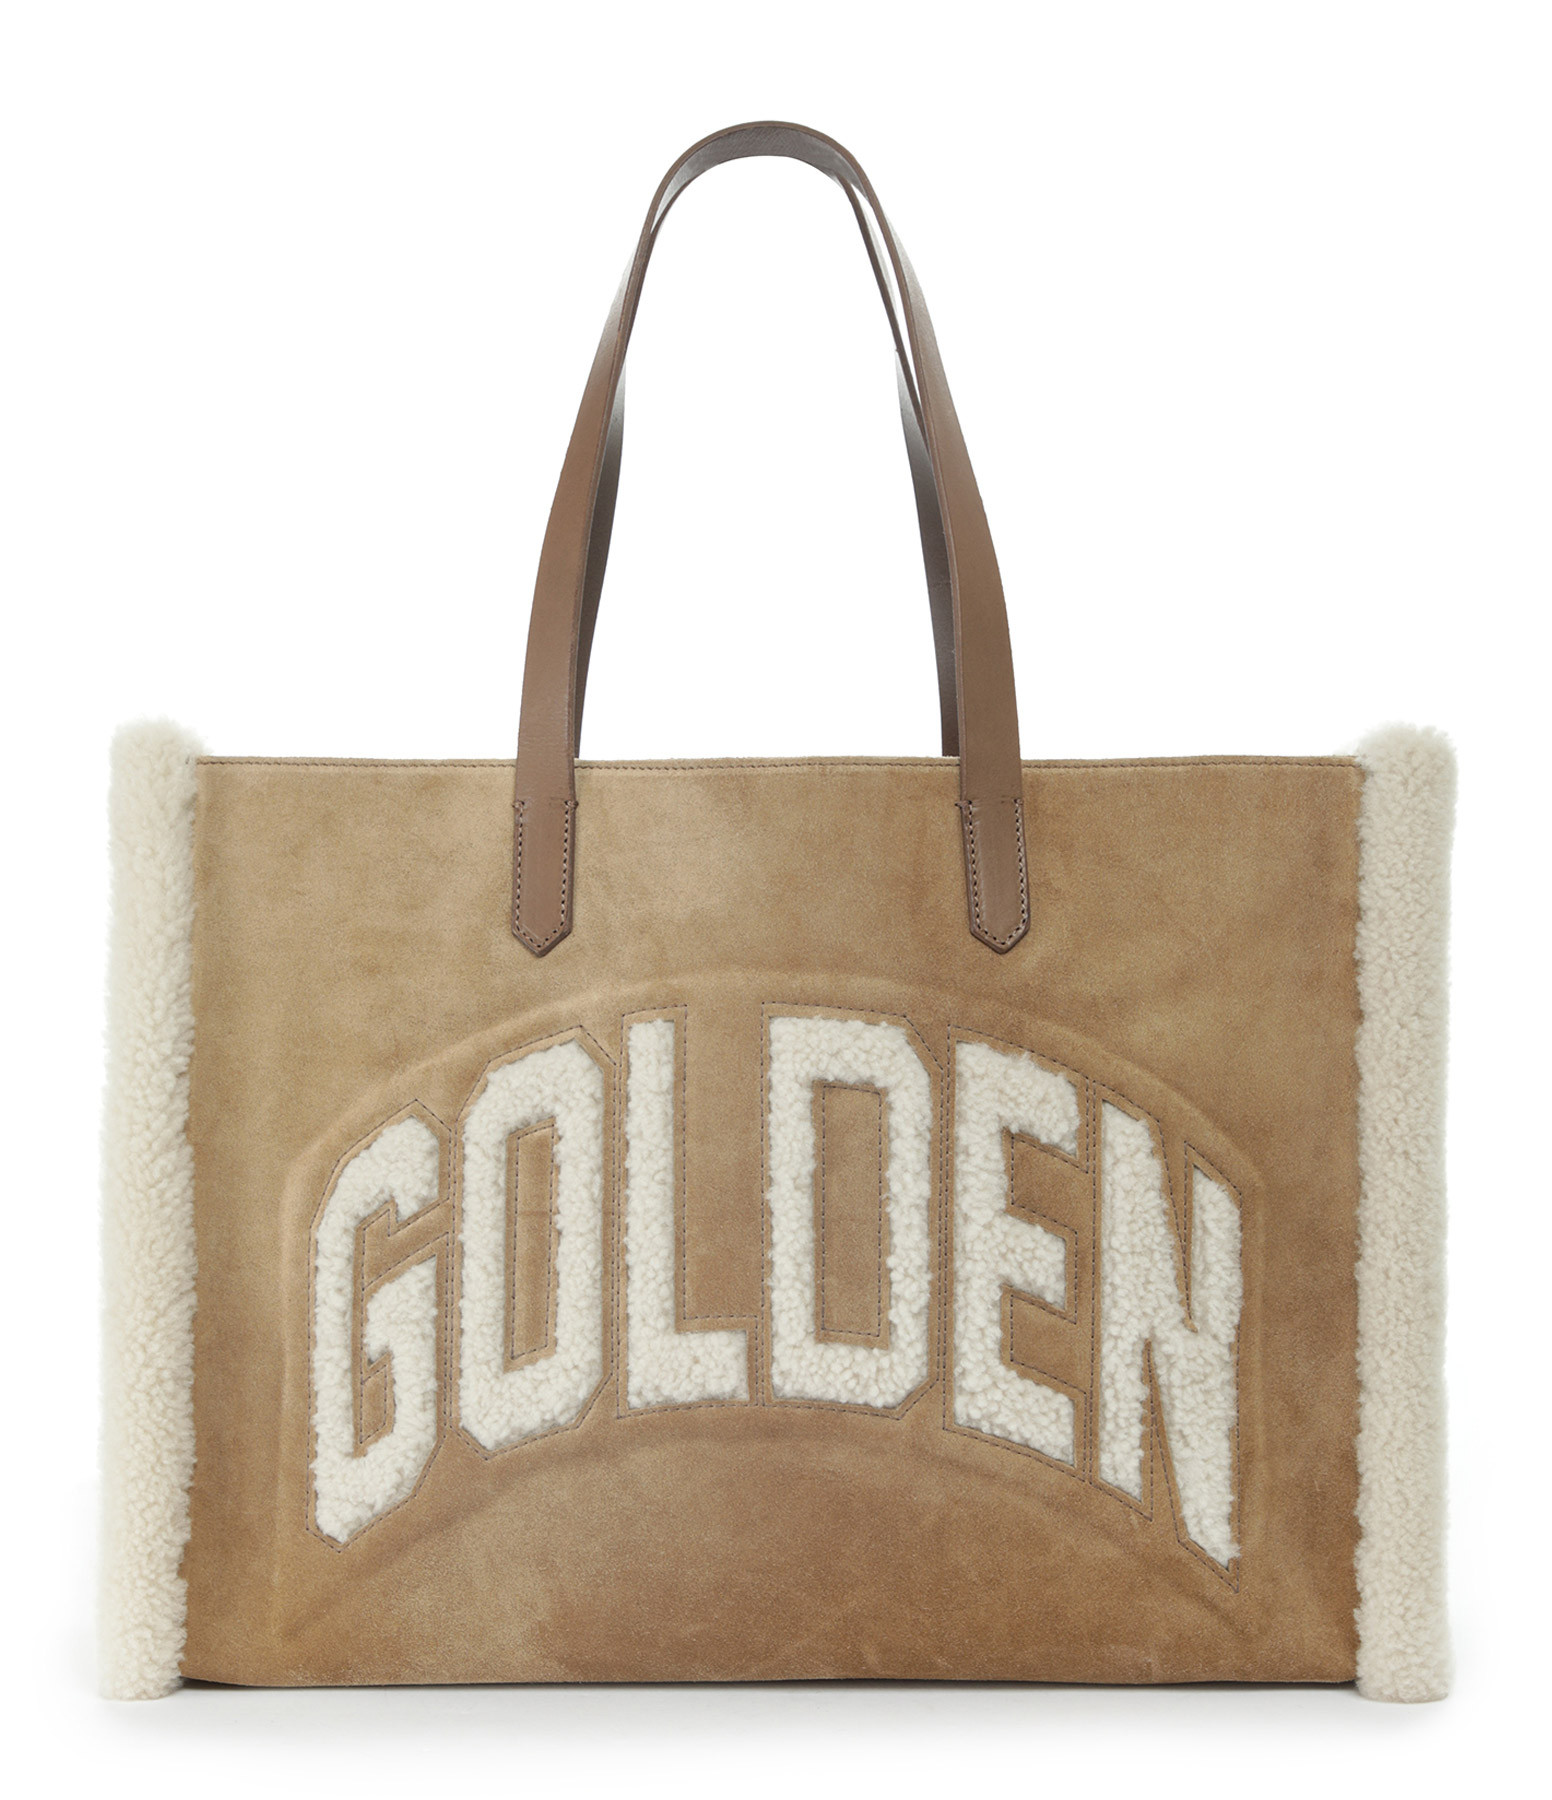 GOLDEN GOOSE - Sac Cabas California Cuir Suédé Camel